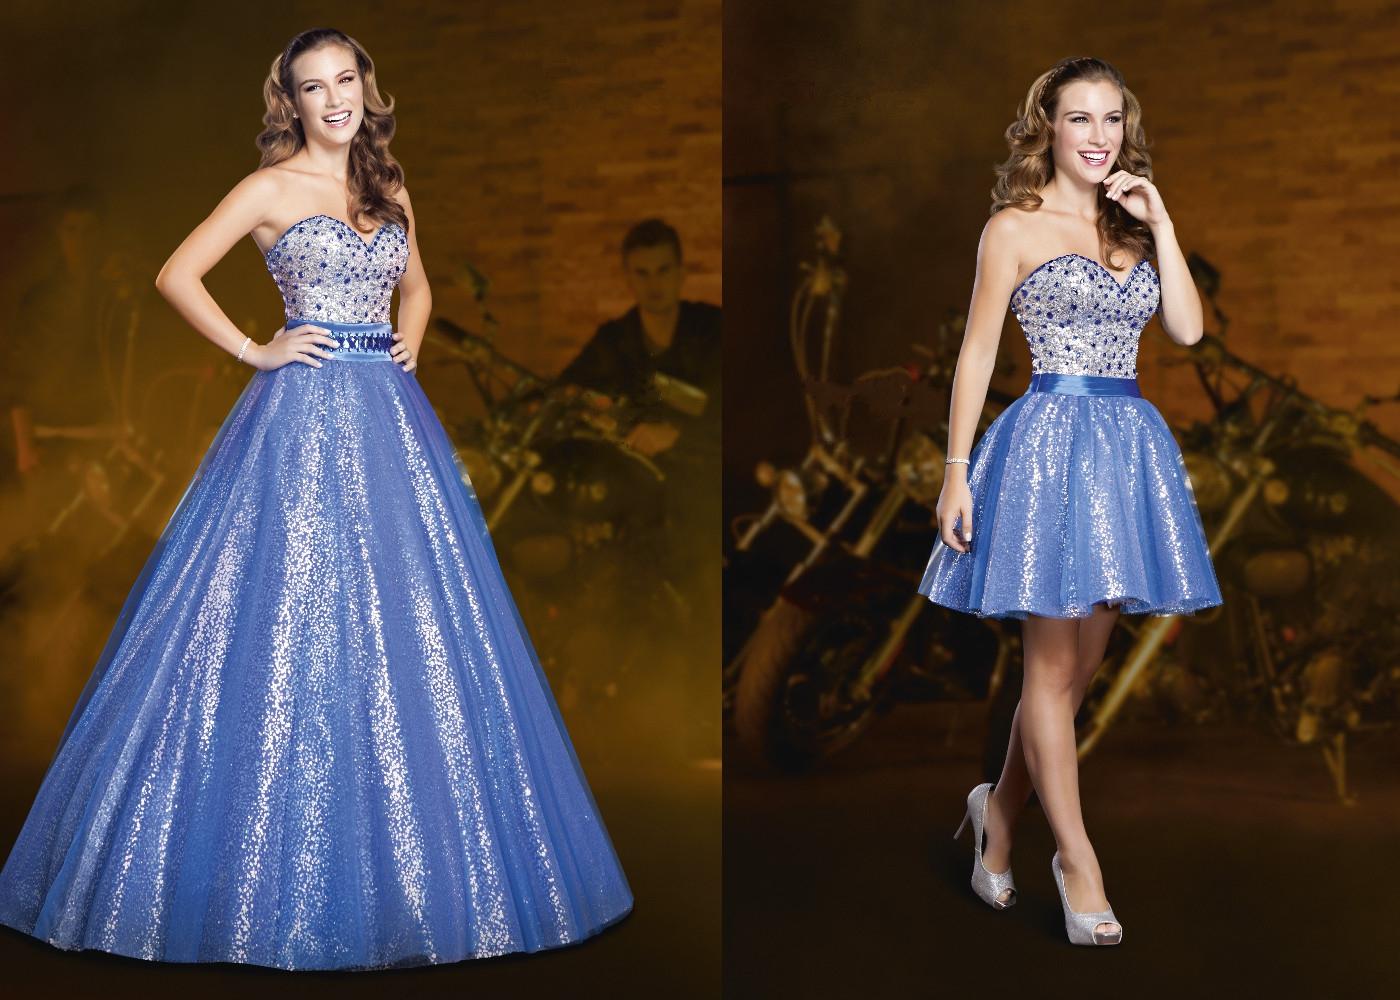 Vestidos de debutantes - Patrícia Noivas e Festas - DEBUTANTES b8b5f3d57d3